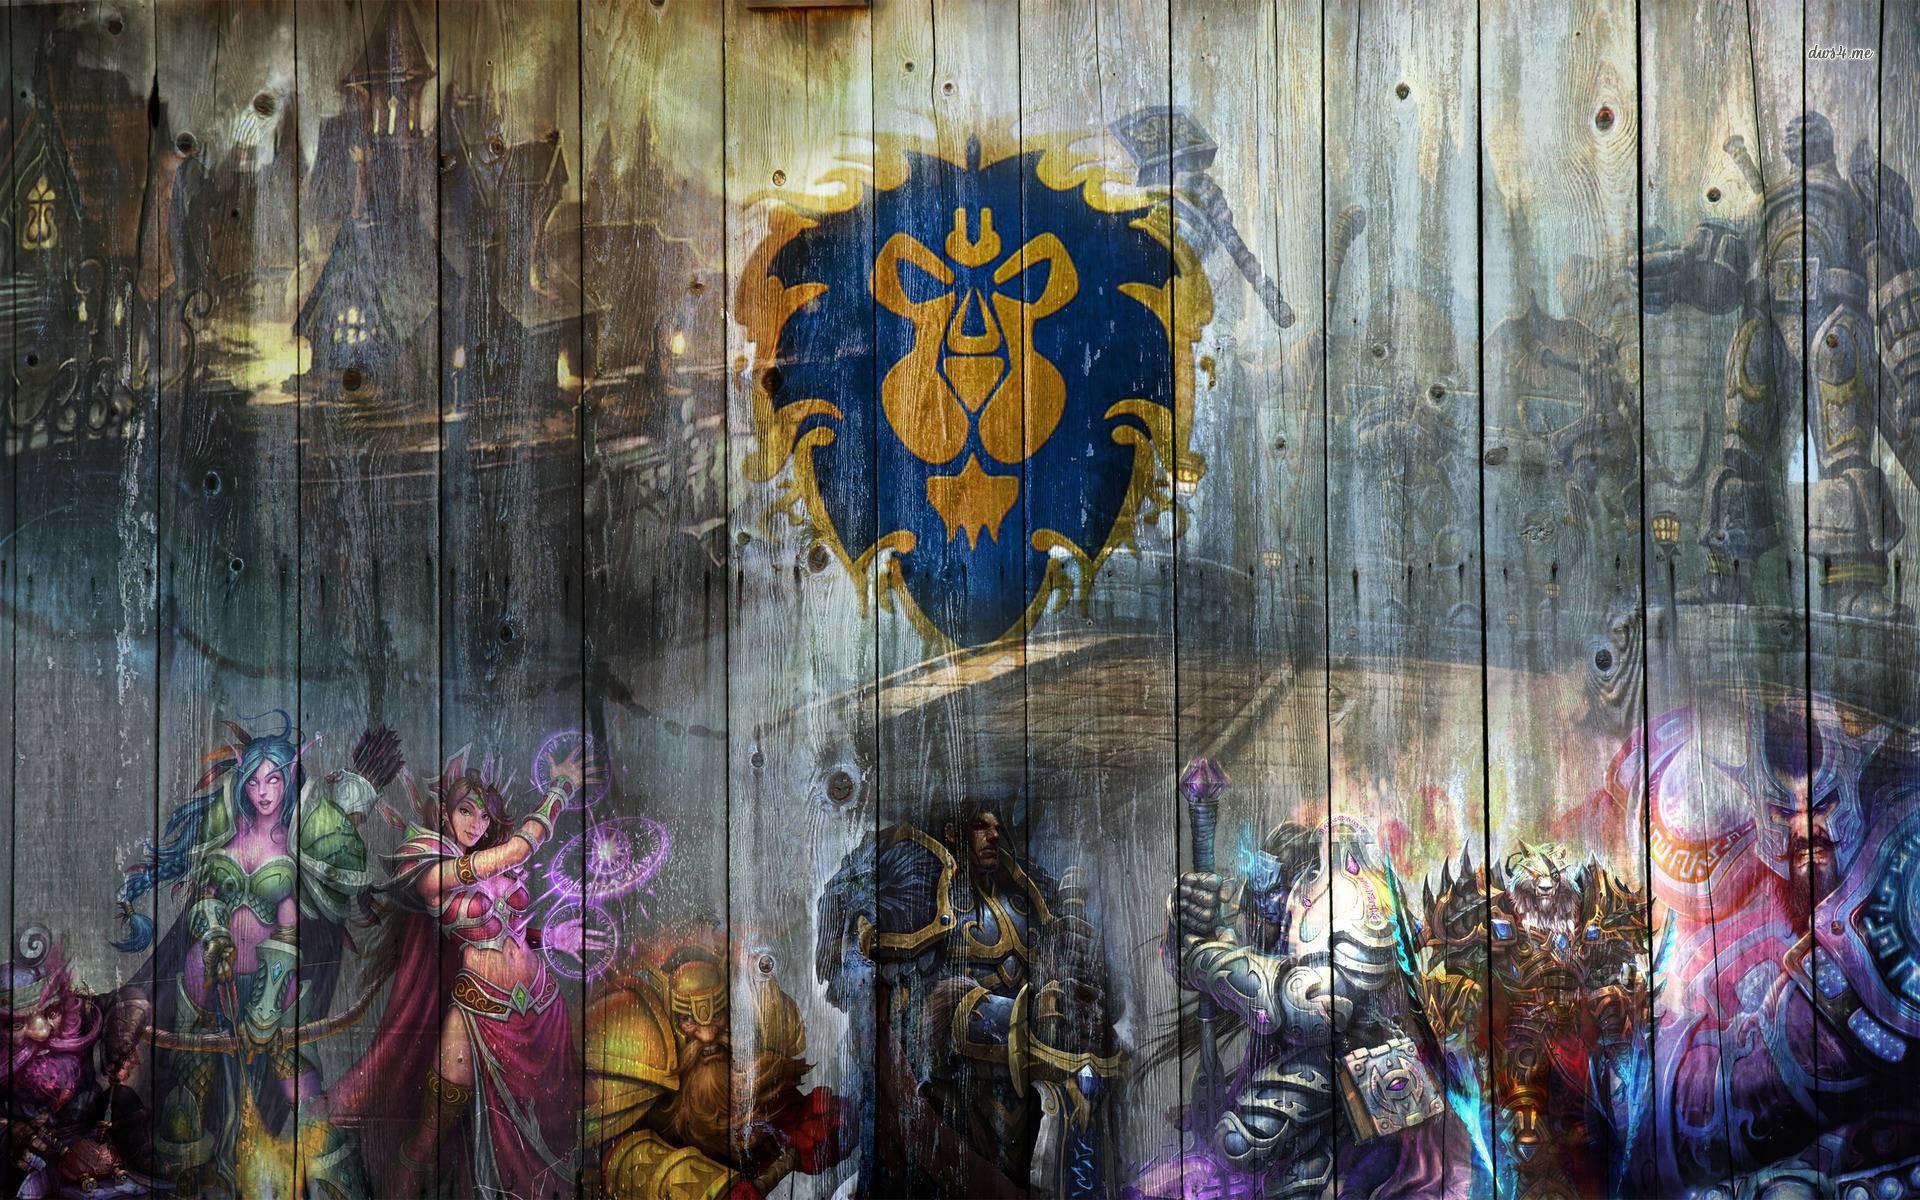 World Of Warcraft Background 20952 px